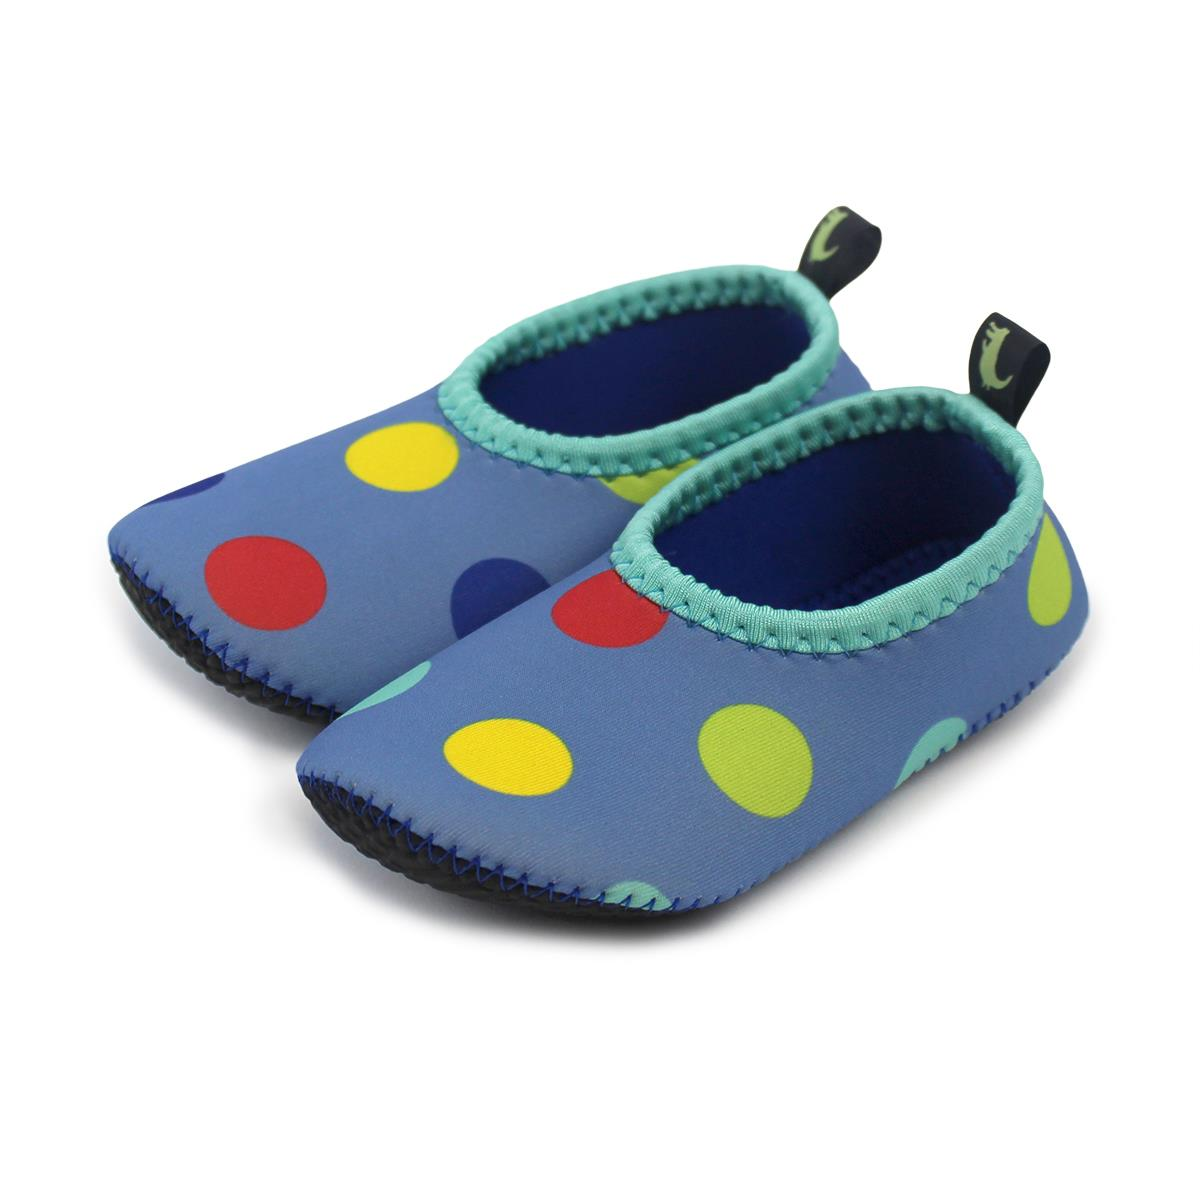 bceaff7fbce2 totes Childrens Gator Grip Swim Shoes Spot